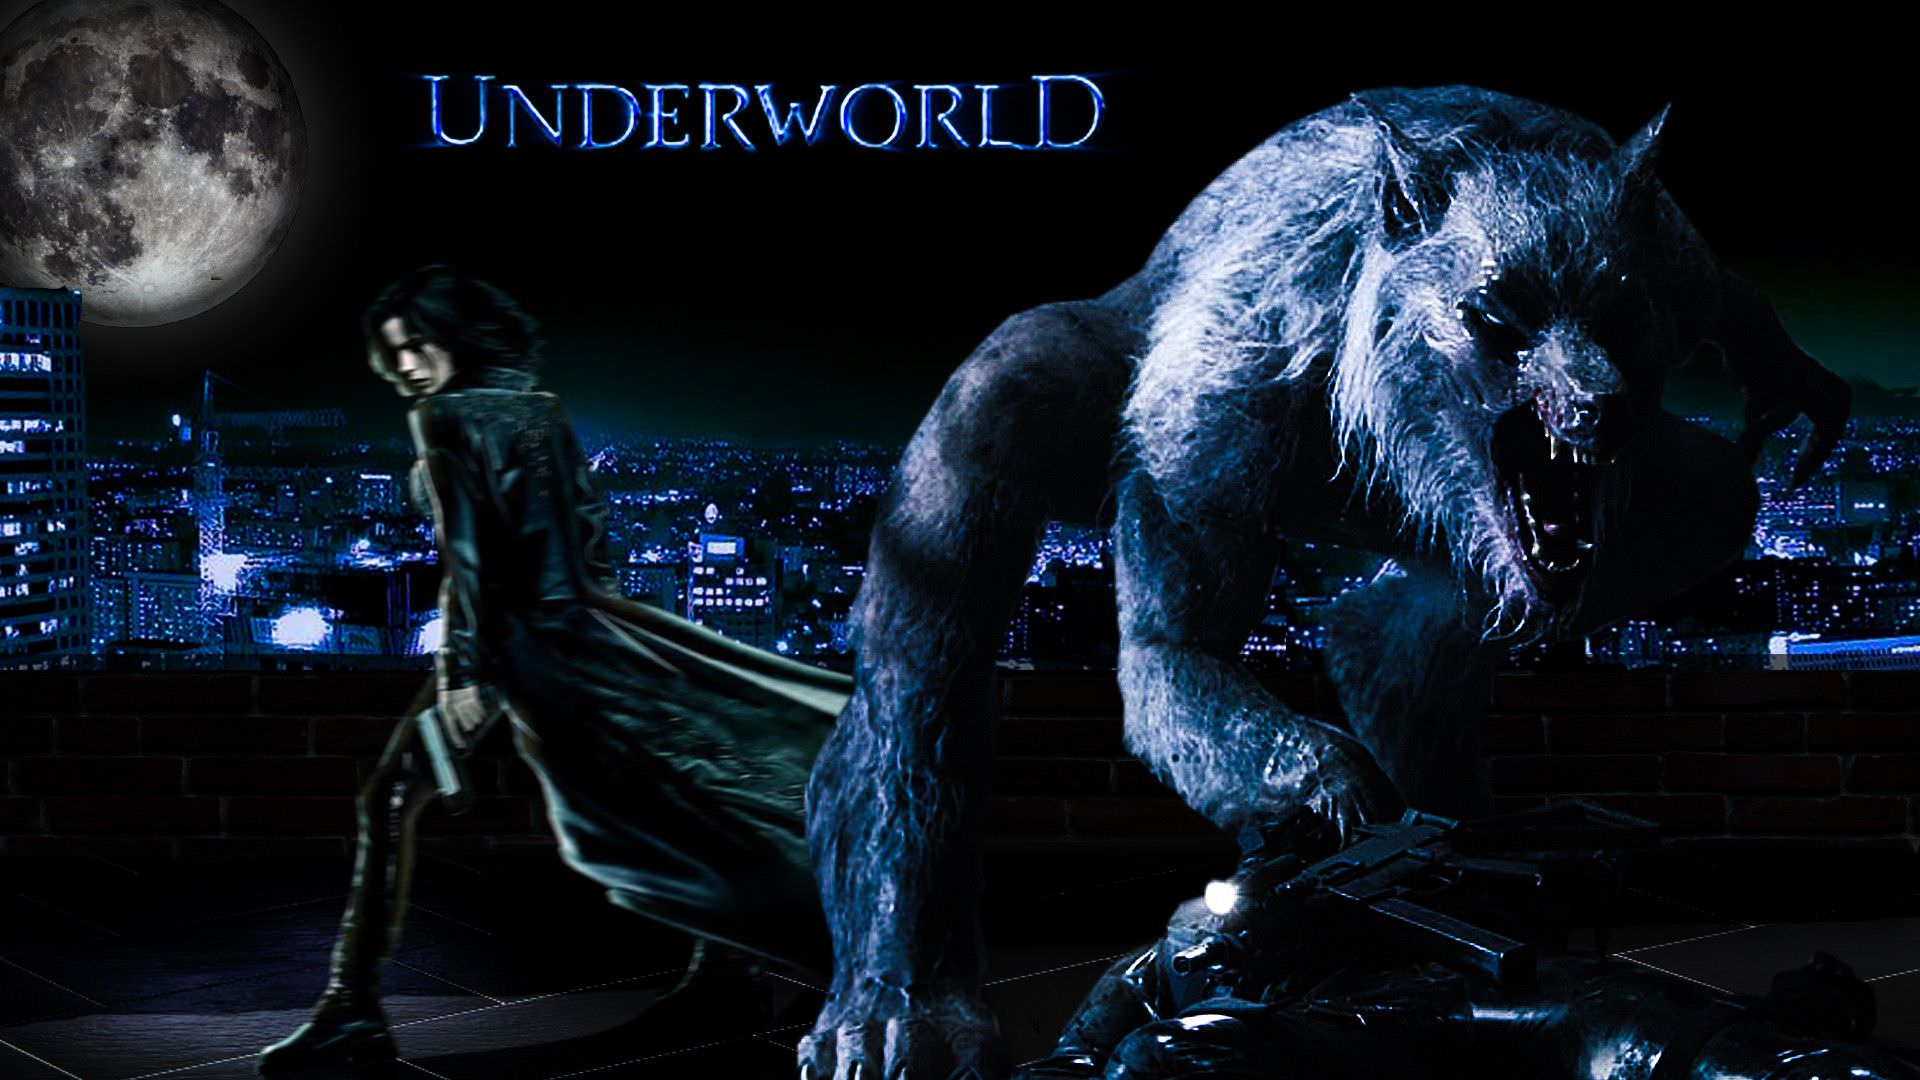 underworld wallpaper HD 1920x1080